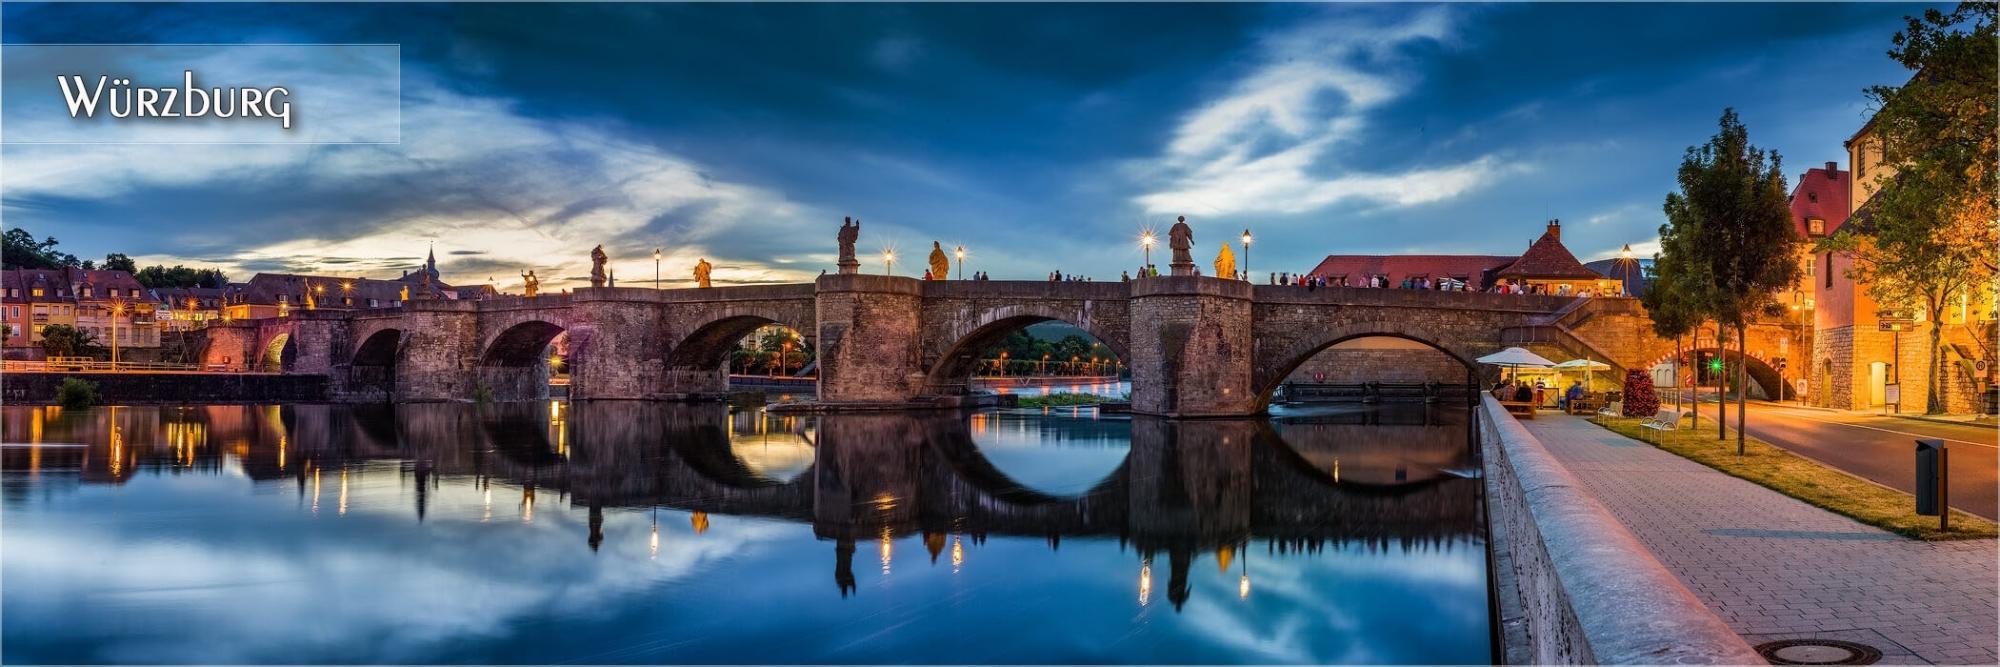 FineArt & Panoramabilder als Wandbild und Küchenrückwand aus Würzburg